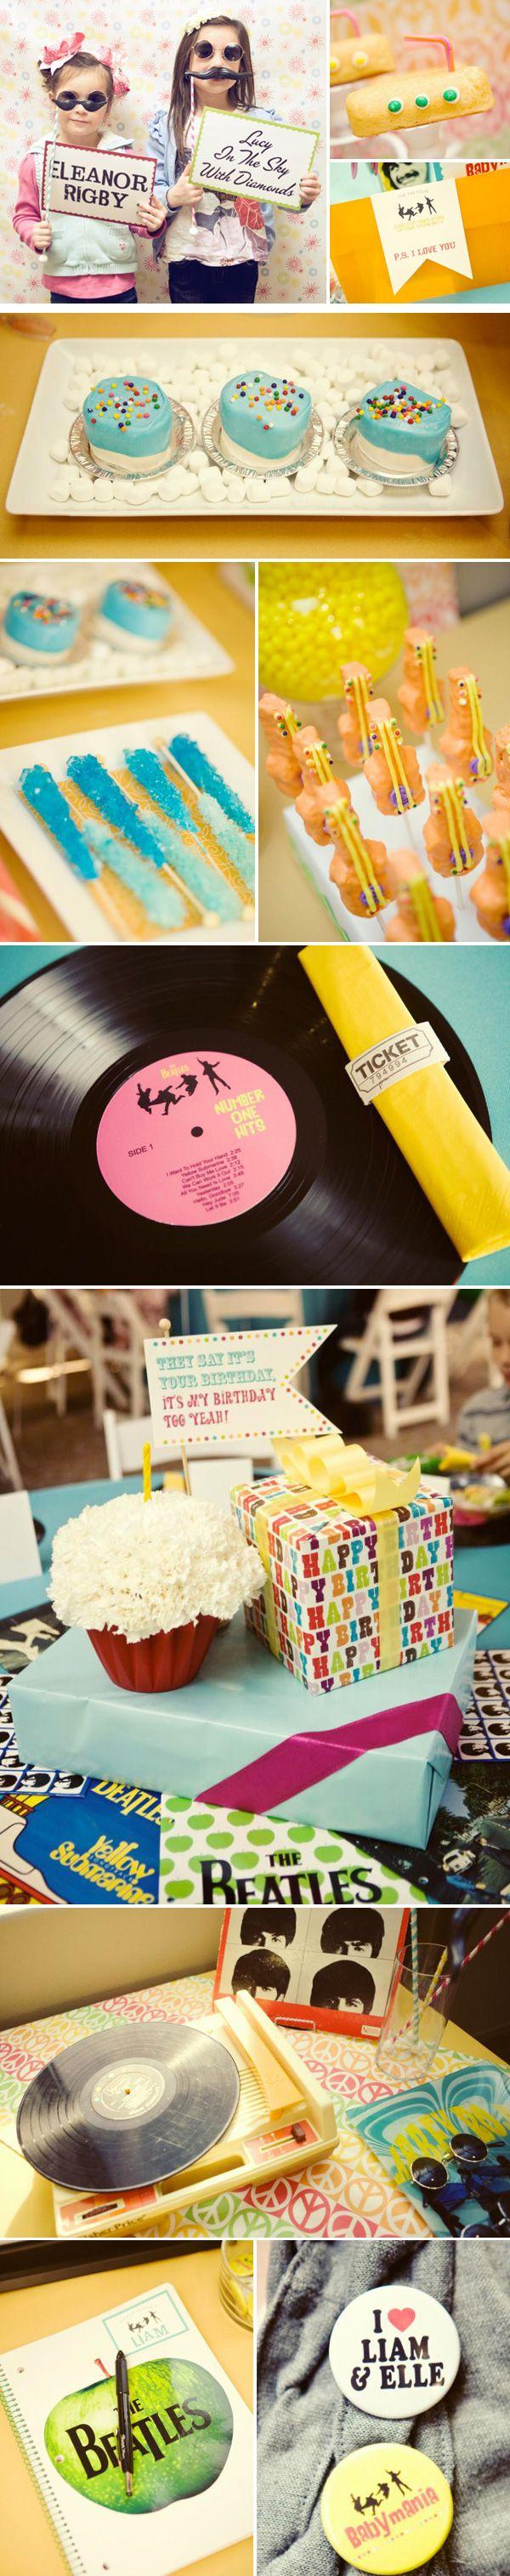 Gmail themes beatles - Beatles Birthday Party Theme